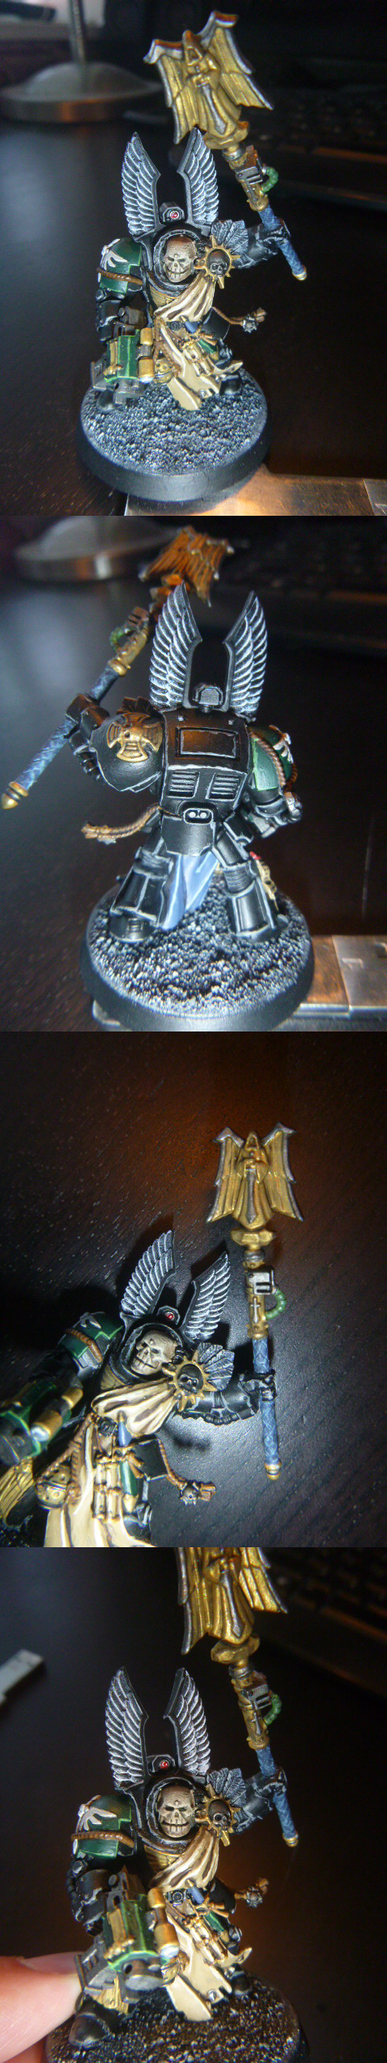 Warhammer 40k - Dark Angel Interrigator-Chaplain by verolesh